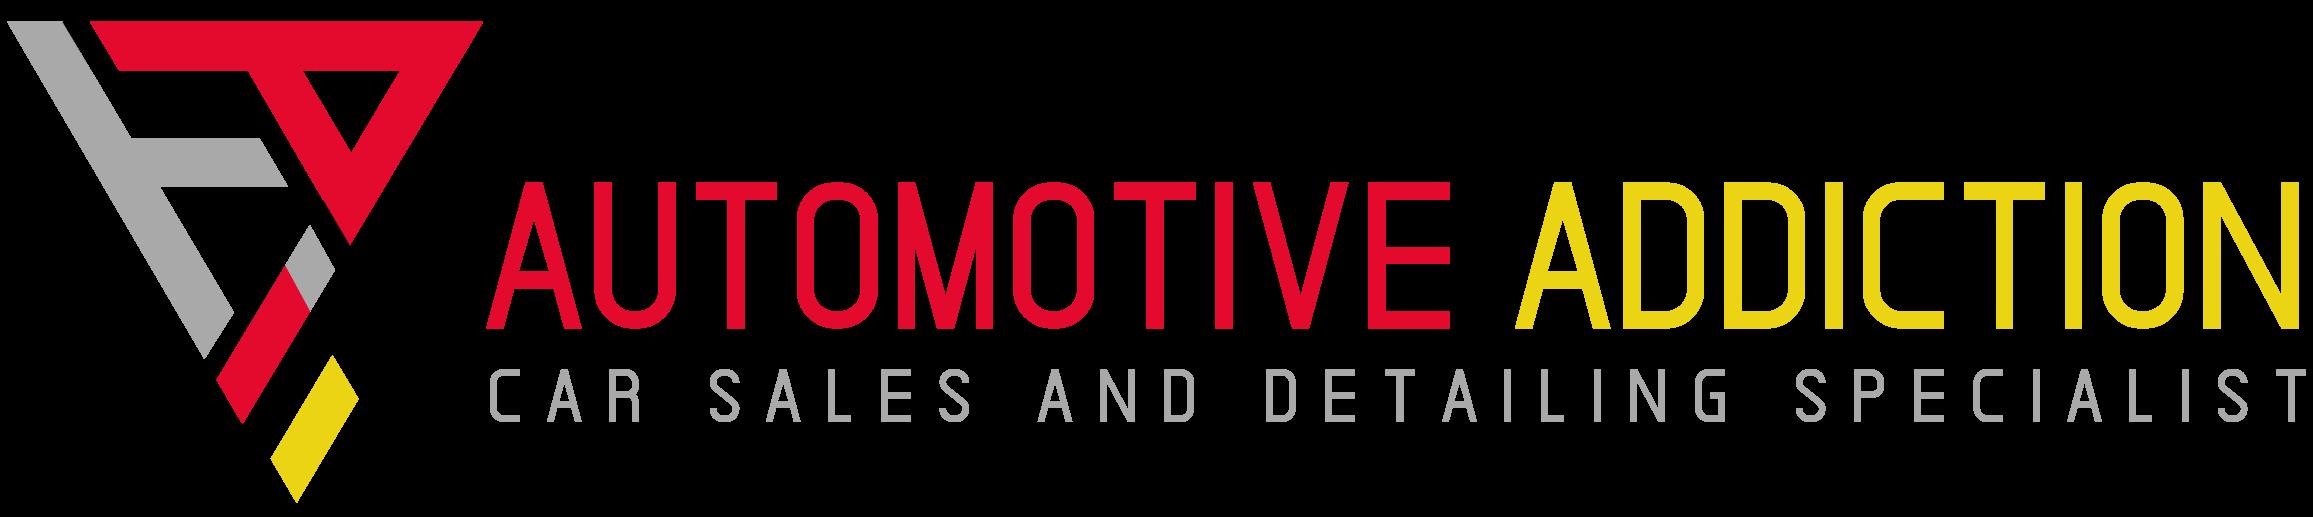 Auto_Addicts_Logo-06-01.png